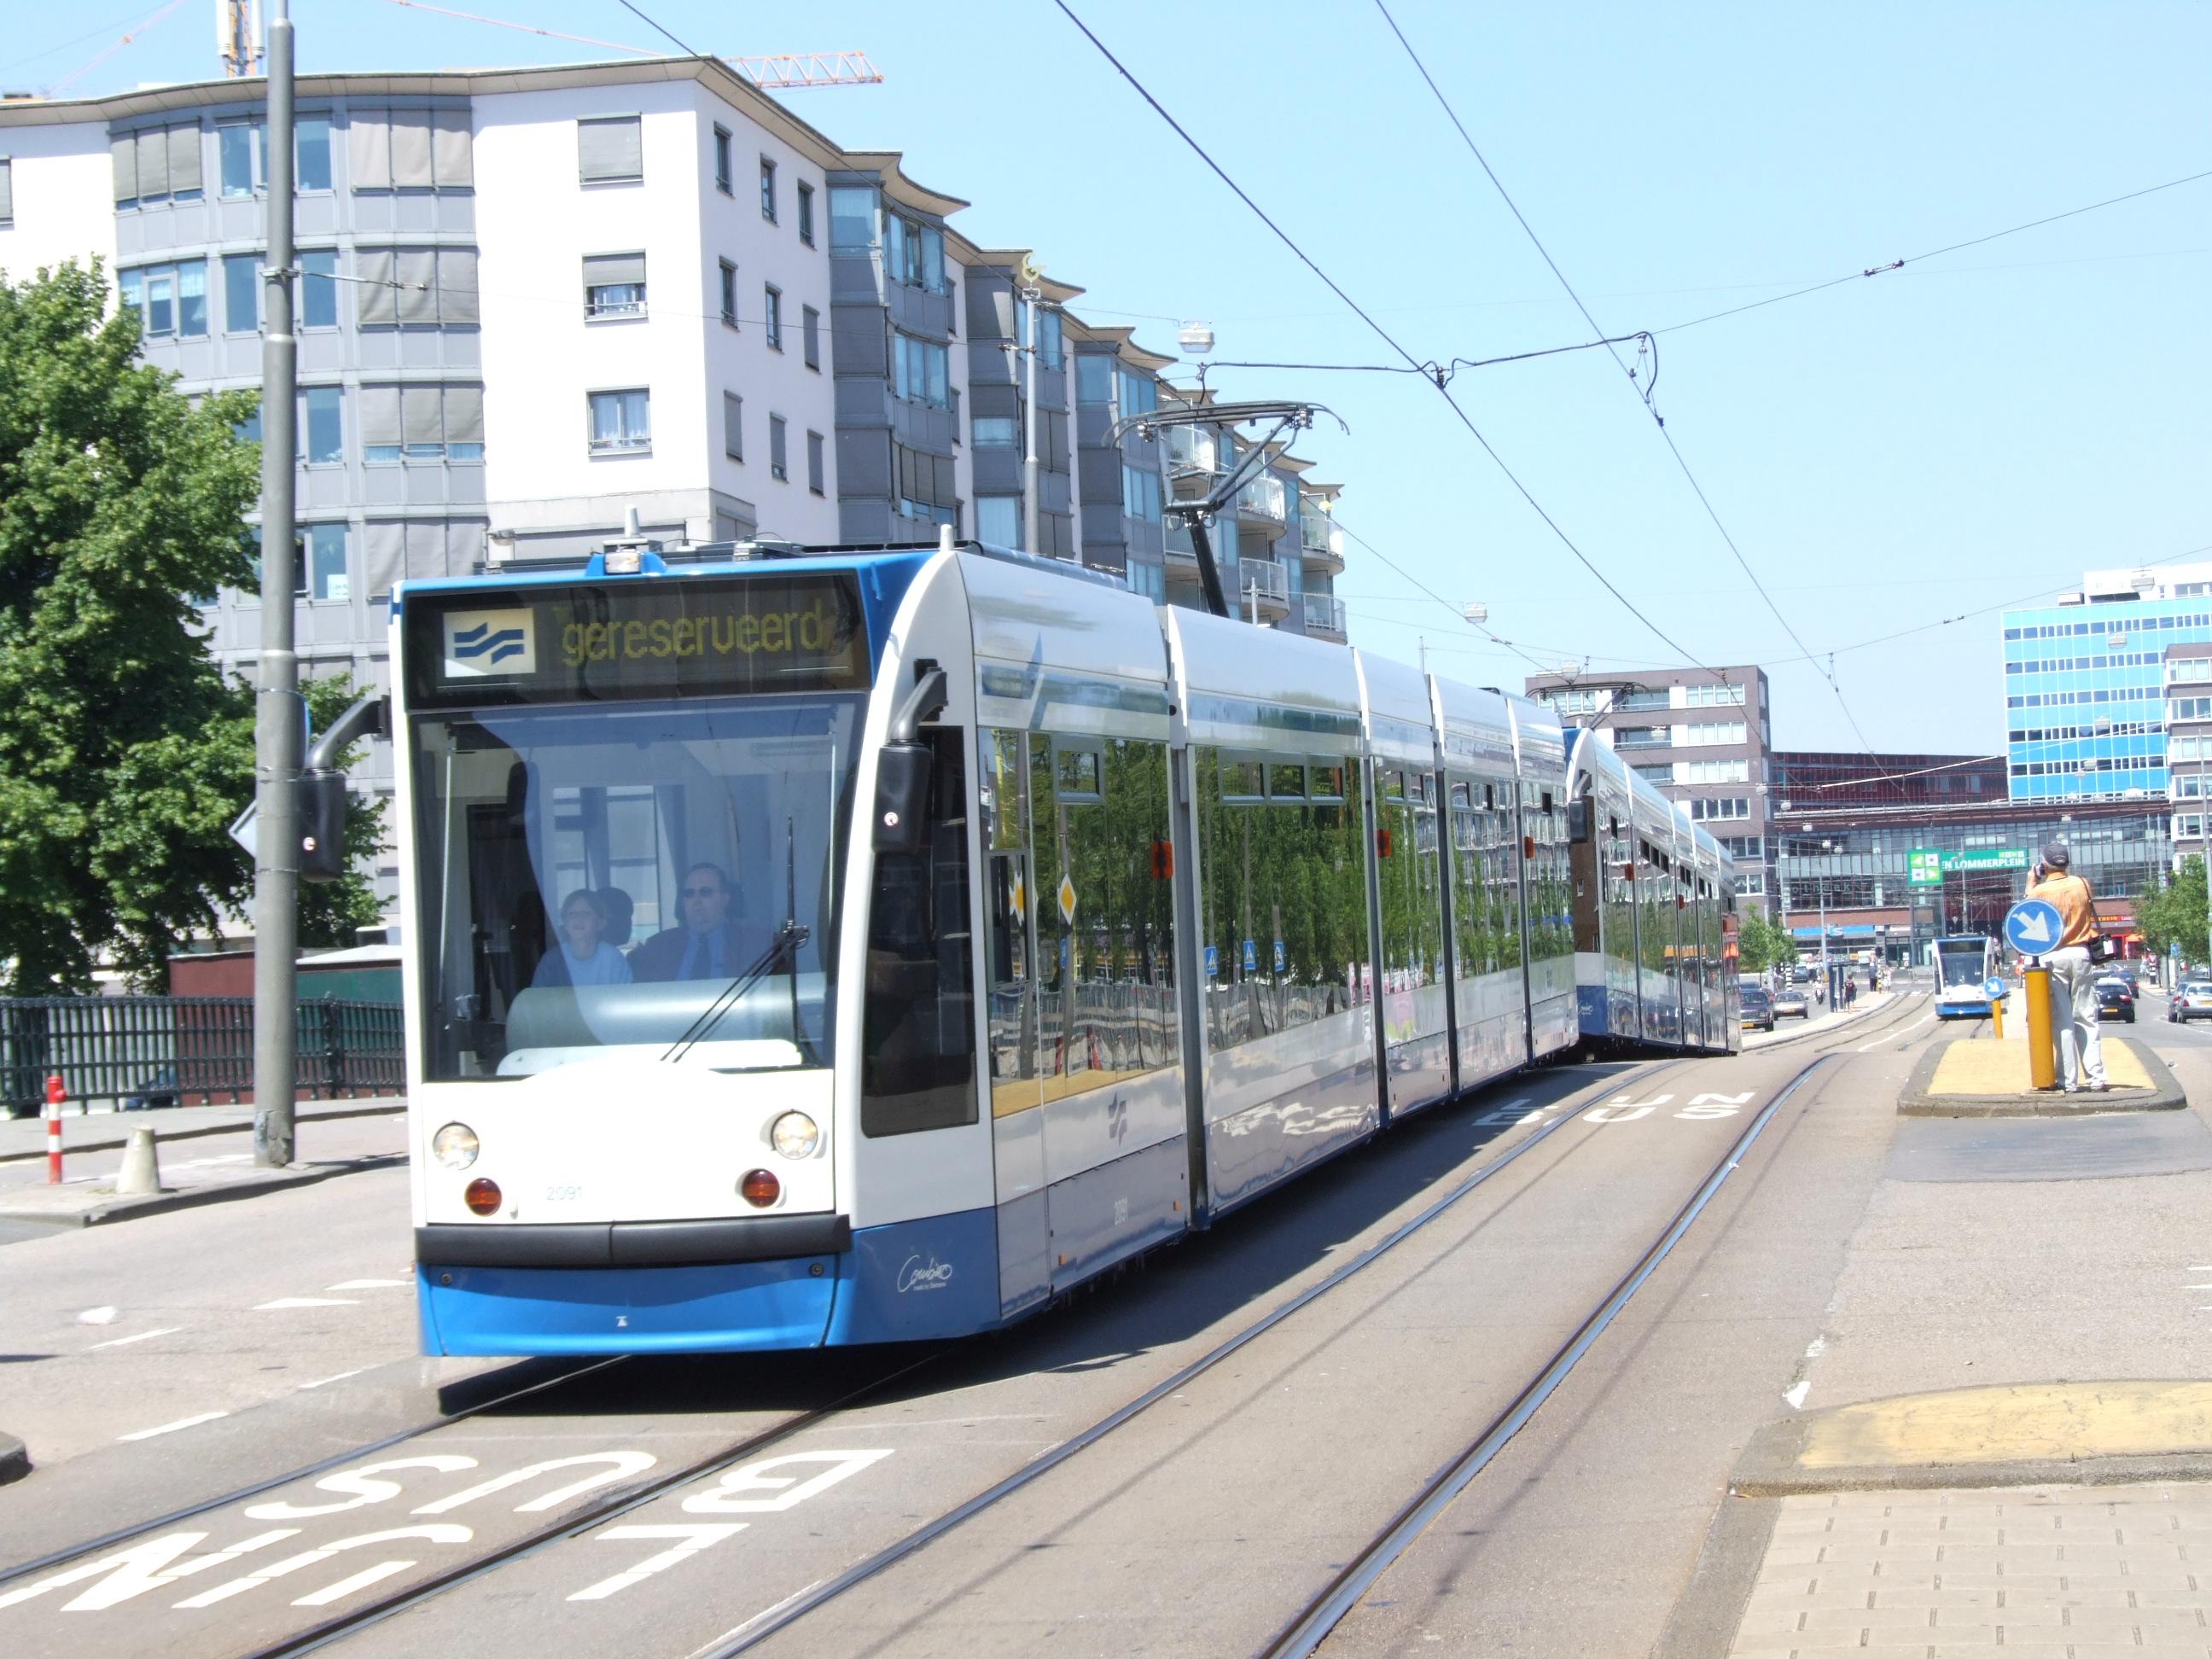 32: Den Haag Tram 830 with trailor 576 at Hoofdweg.